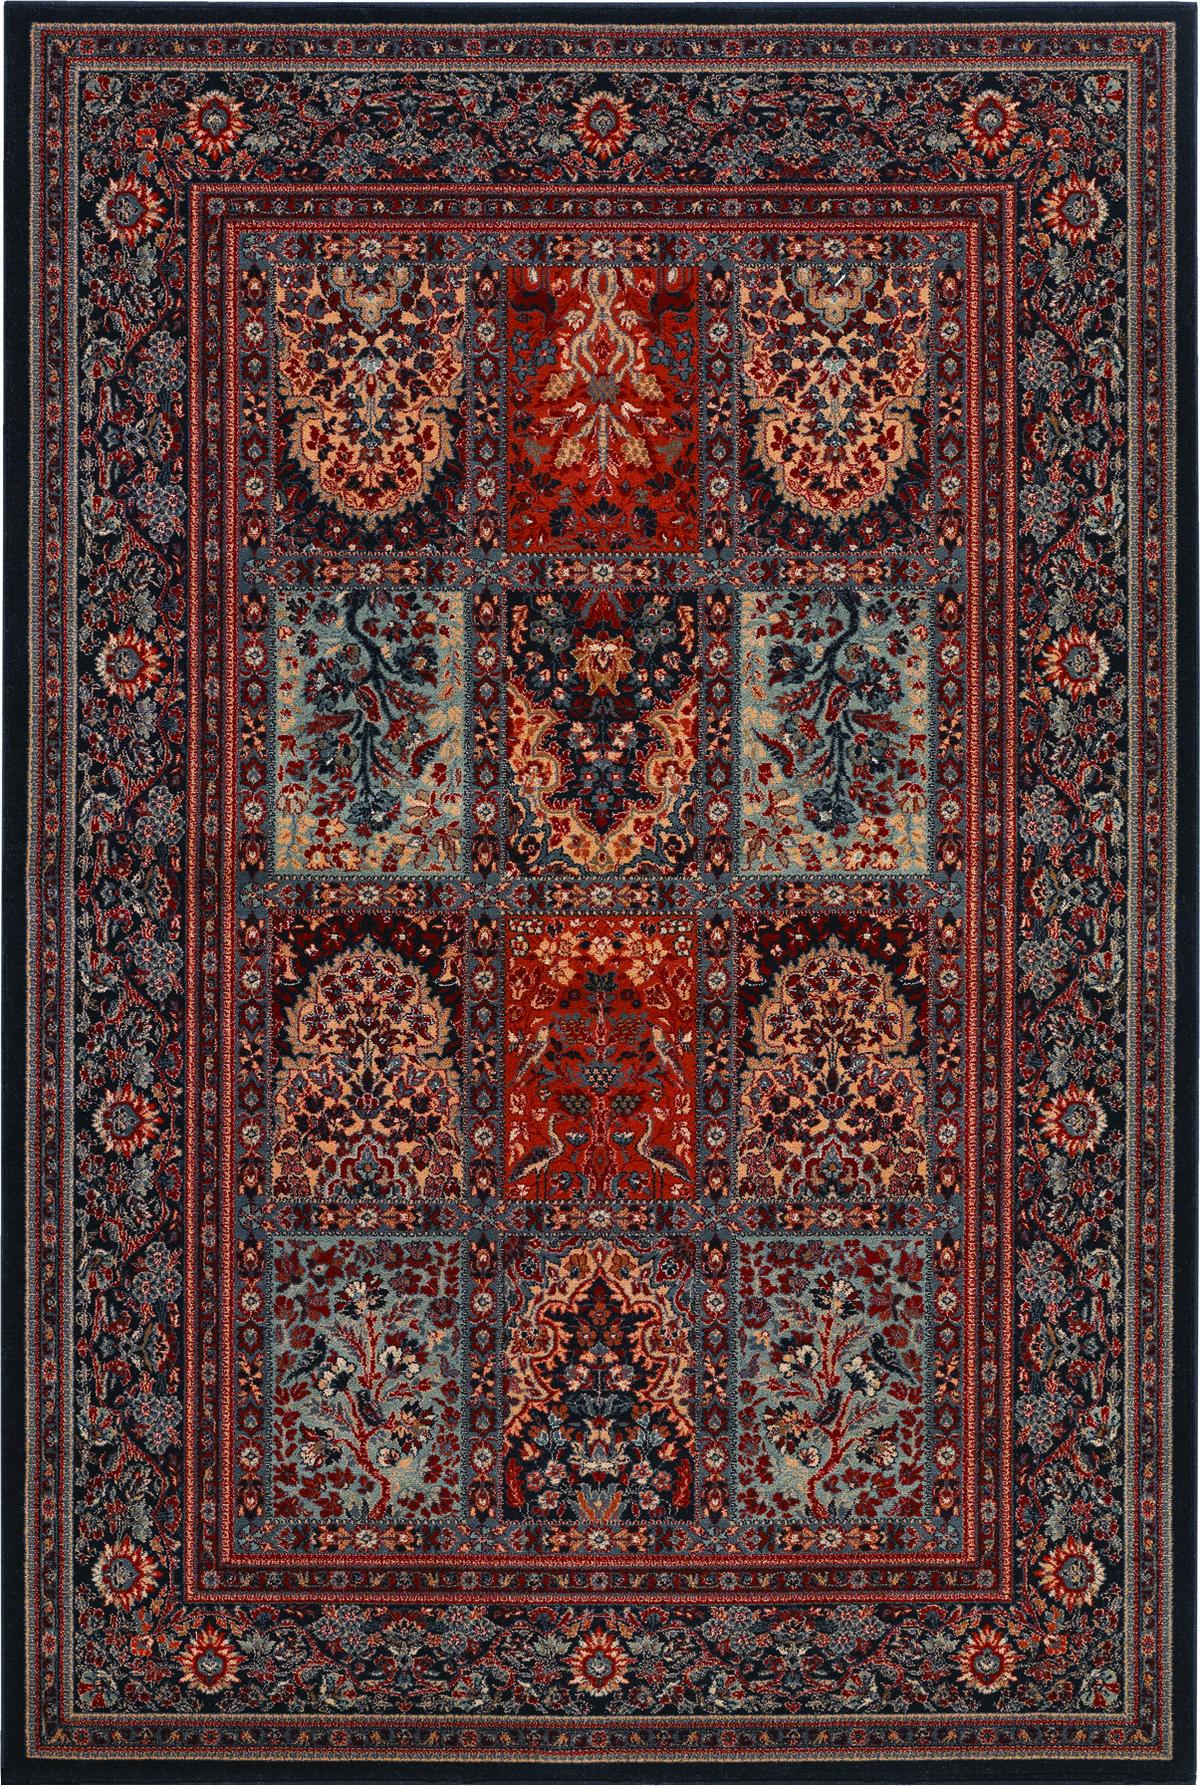 Couristan Timeless Treasures Vintage Baktia Ebony Couristan Persian Area Rugs Rugs On Carpet